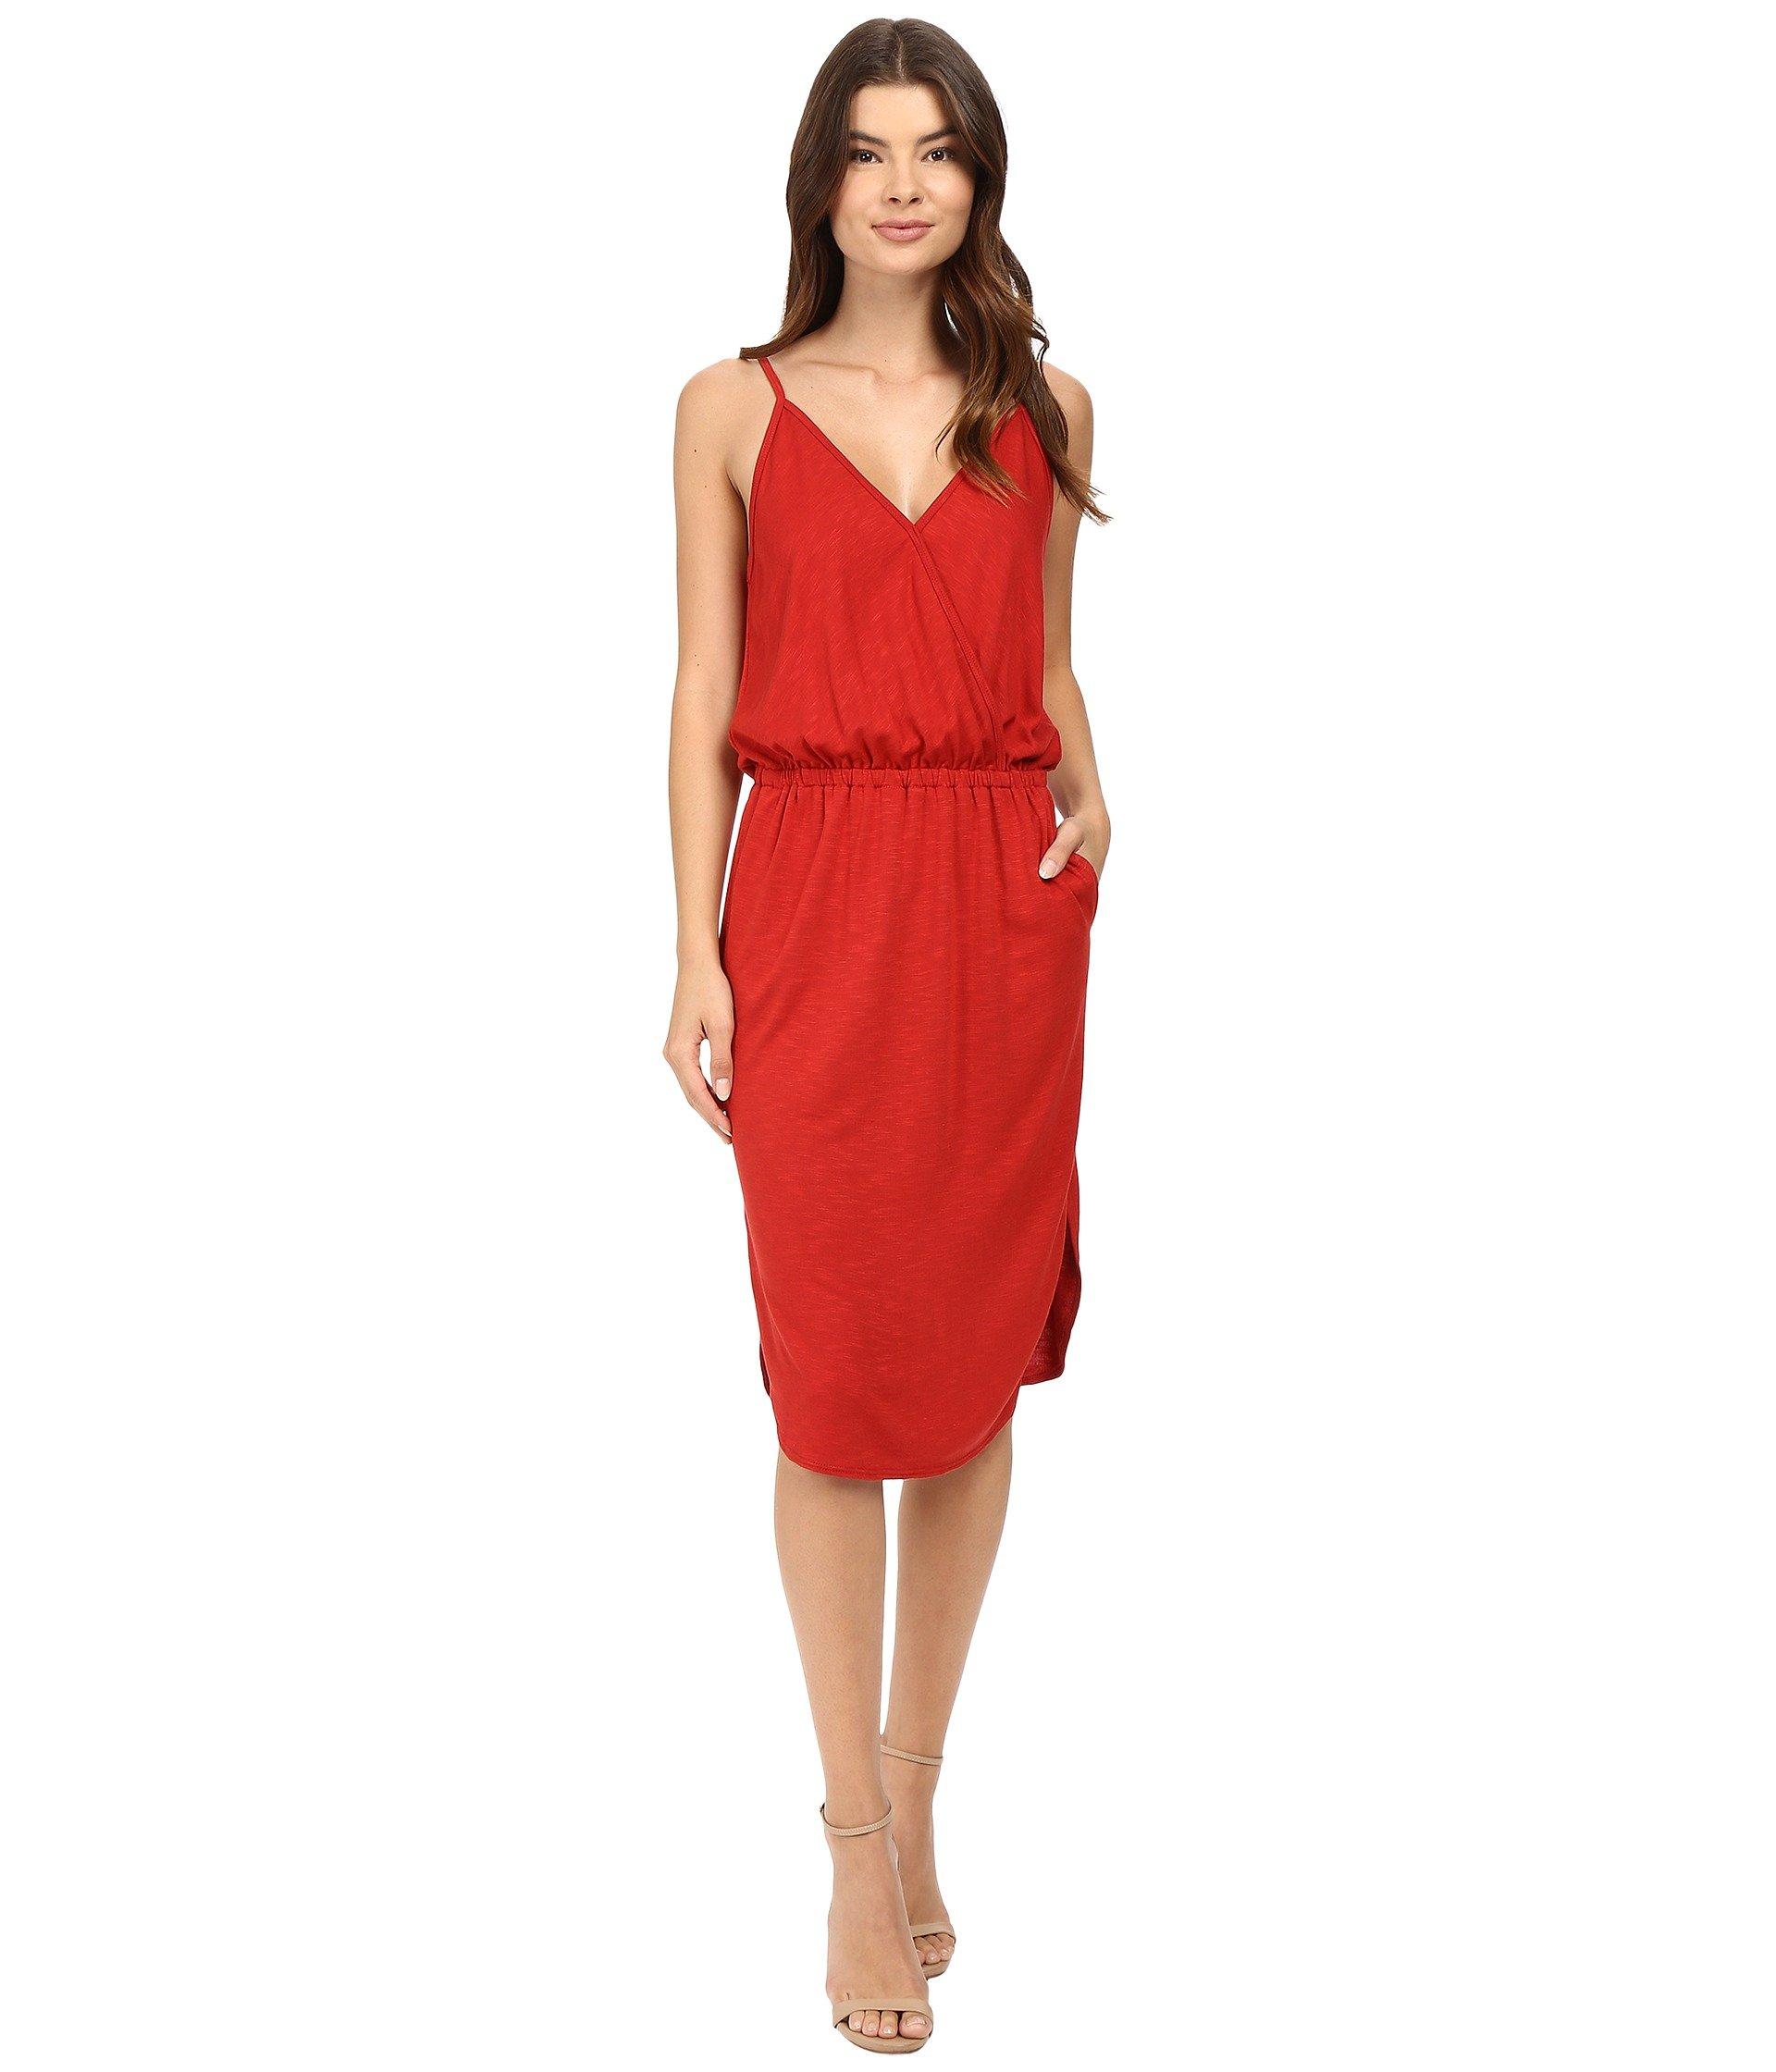 Lanston Surplice Cami Dress